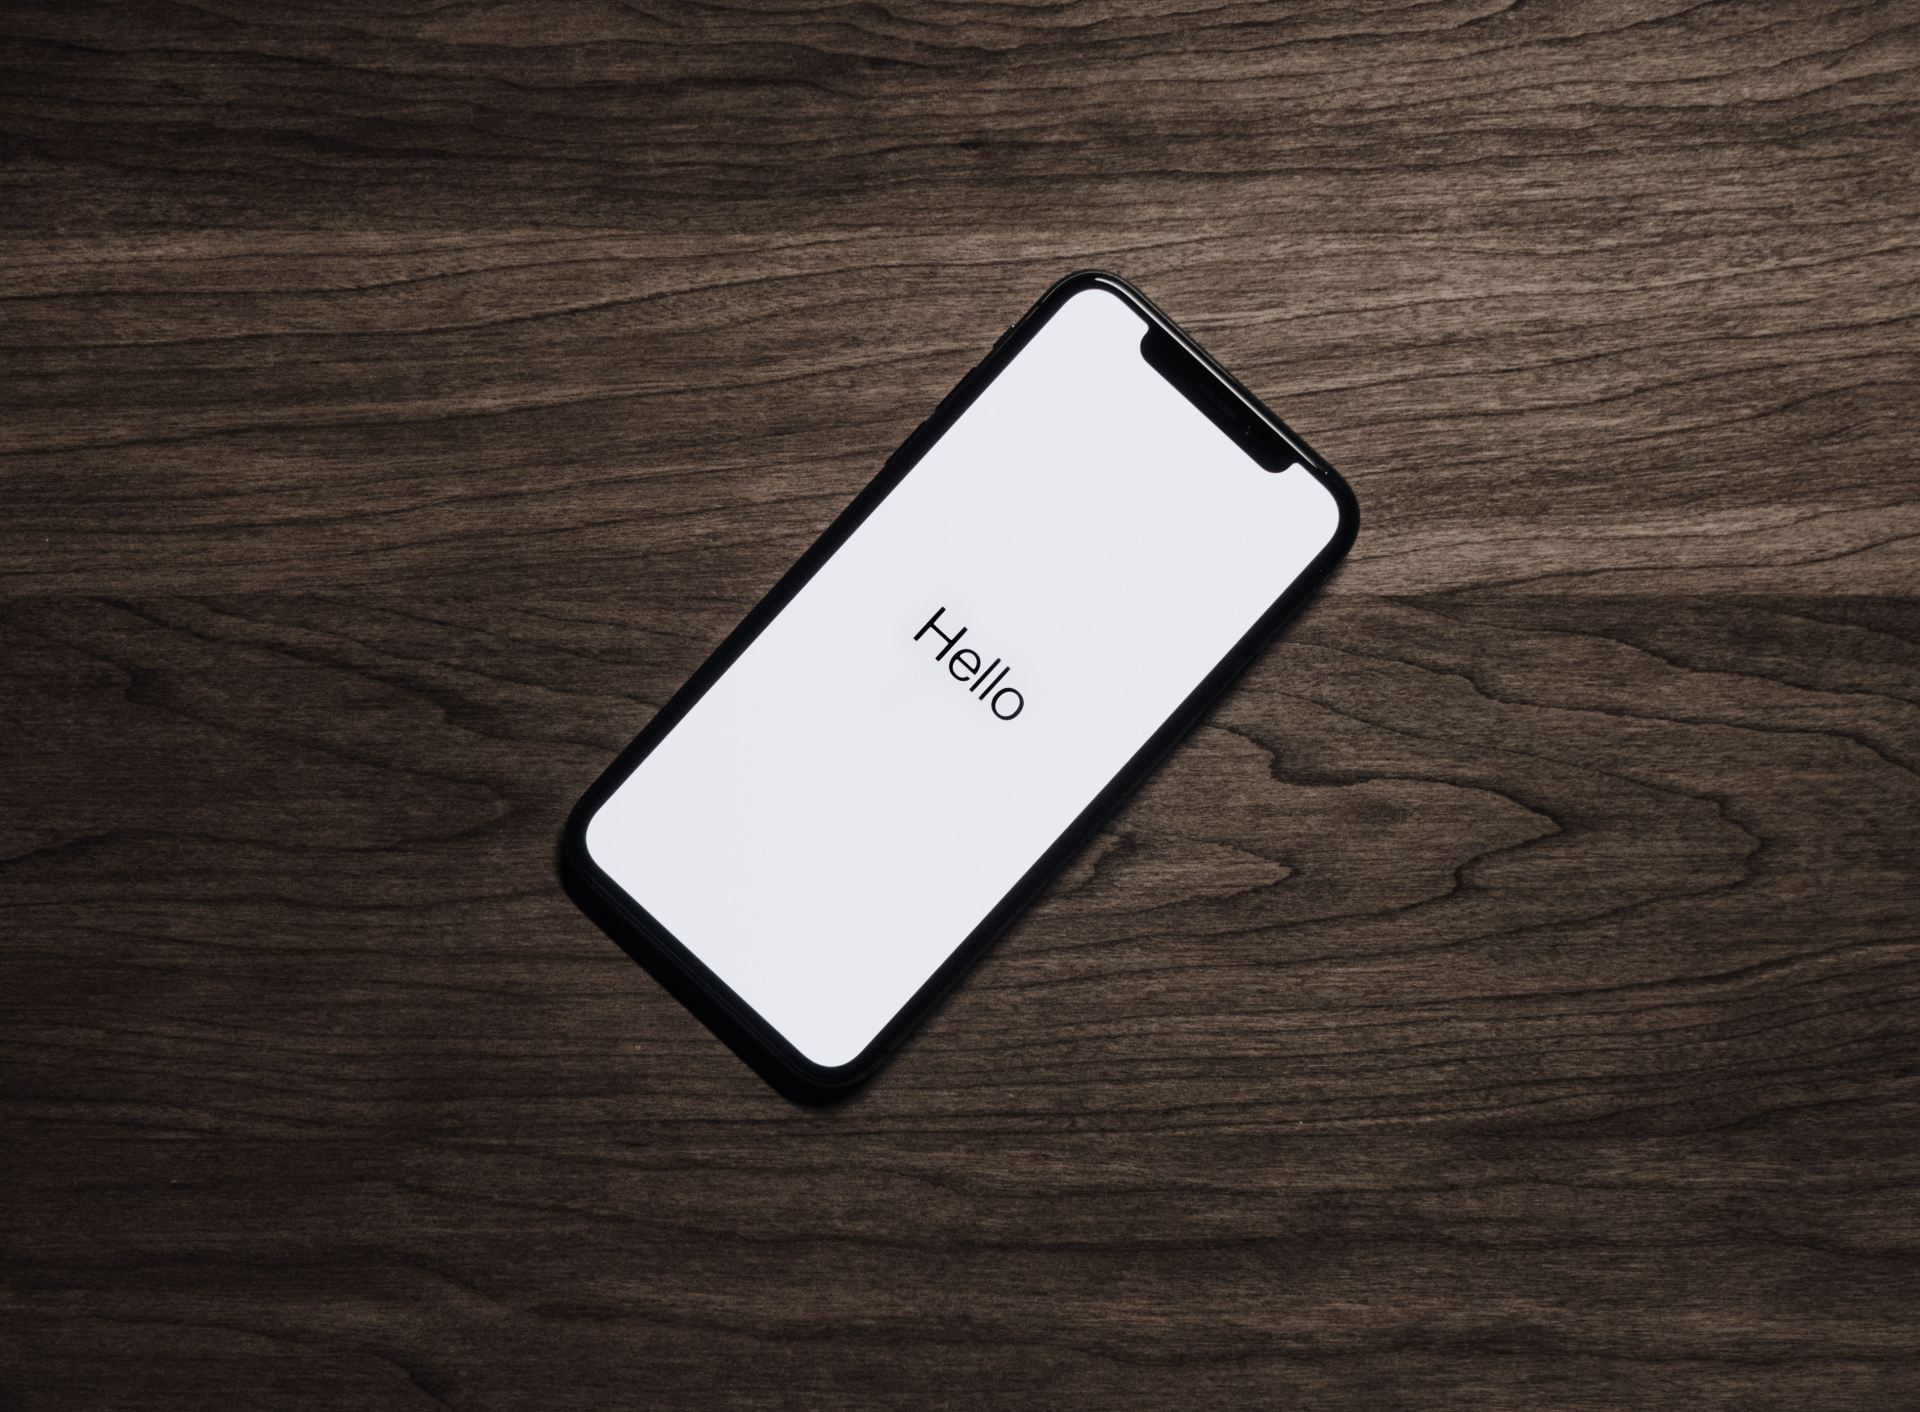 'Hello' iPhone welcome screen